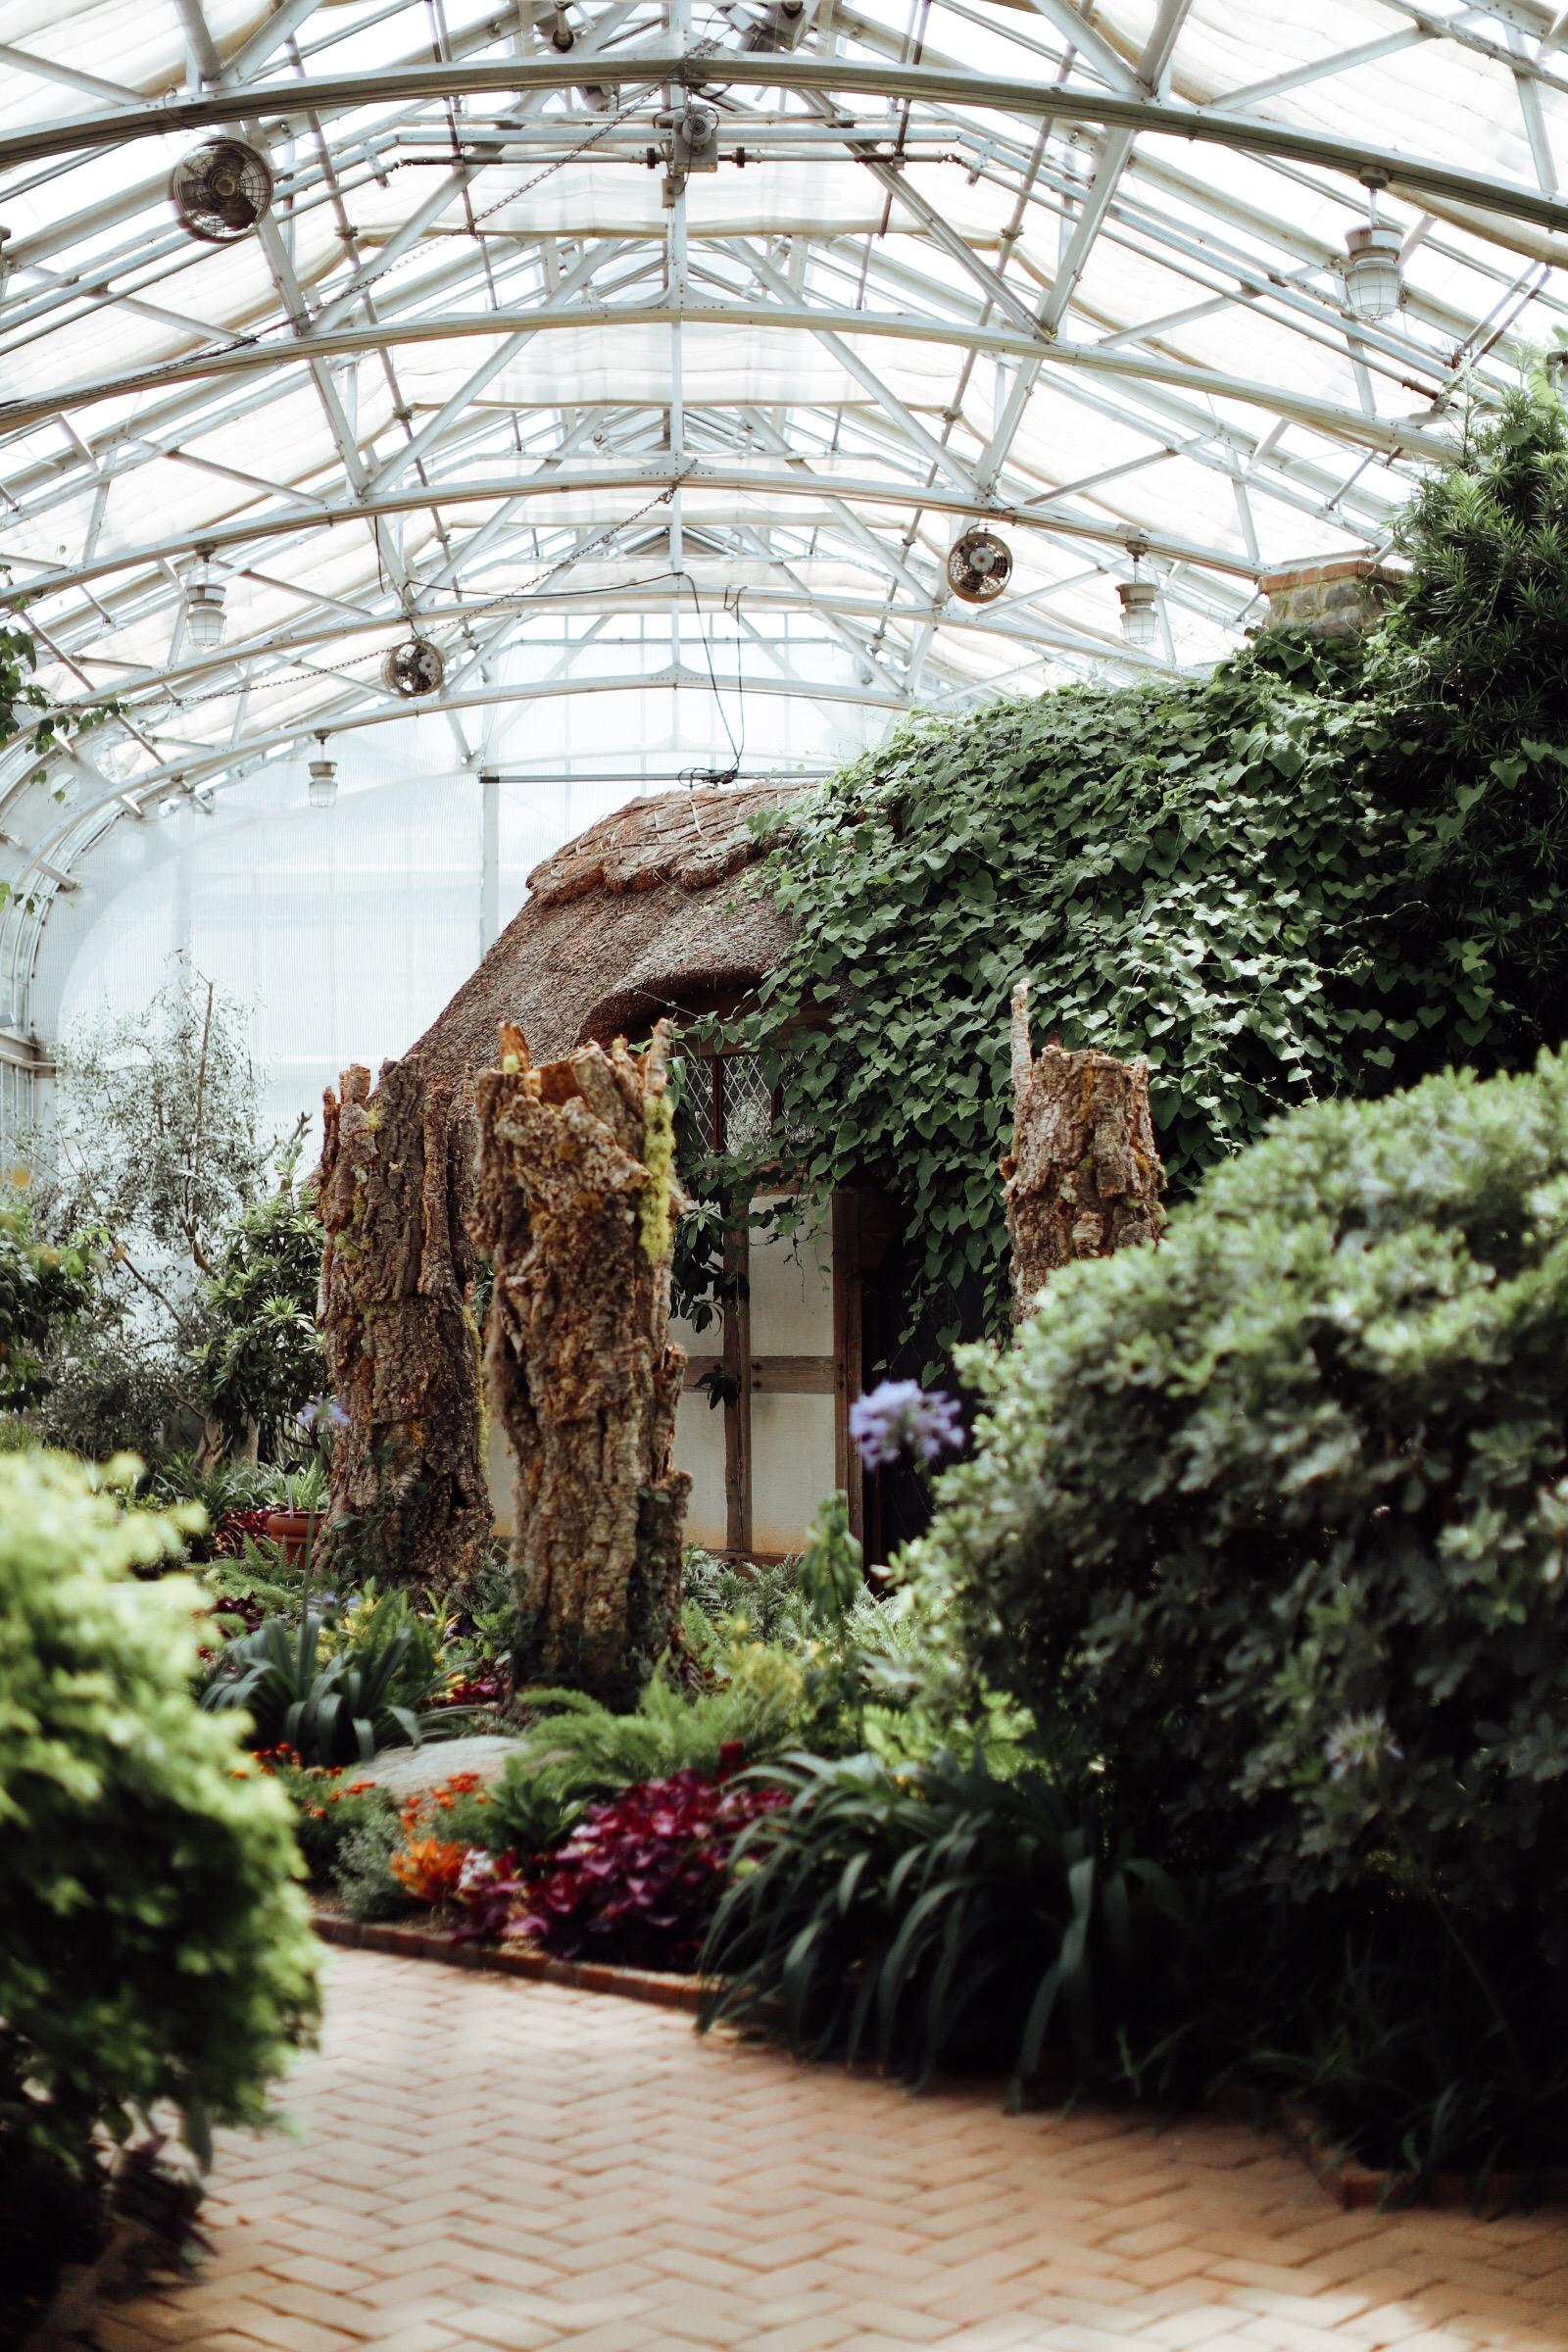 Caila Quinn Richmond Virginia Travel Guide Tour Lewis Ginter Botanical Gardens